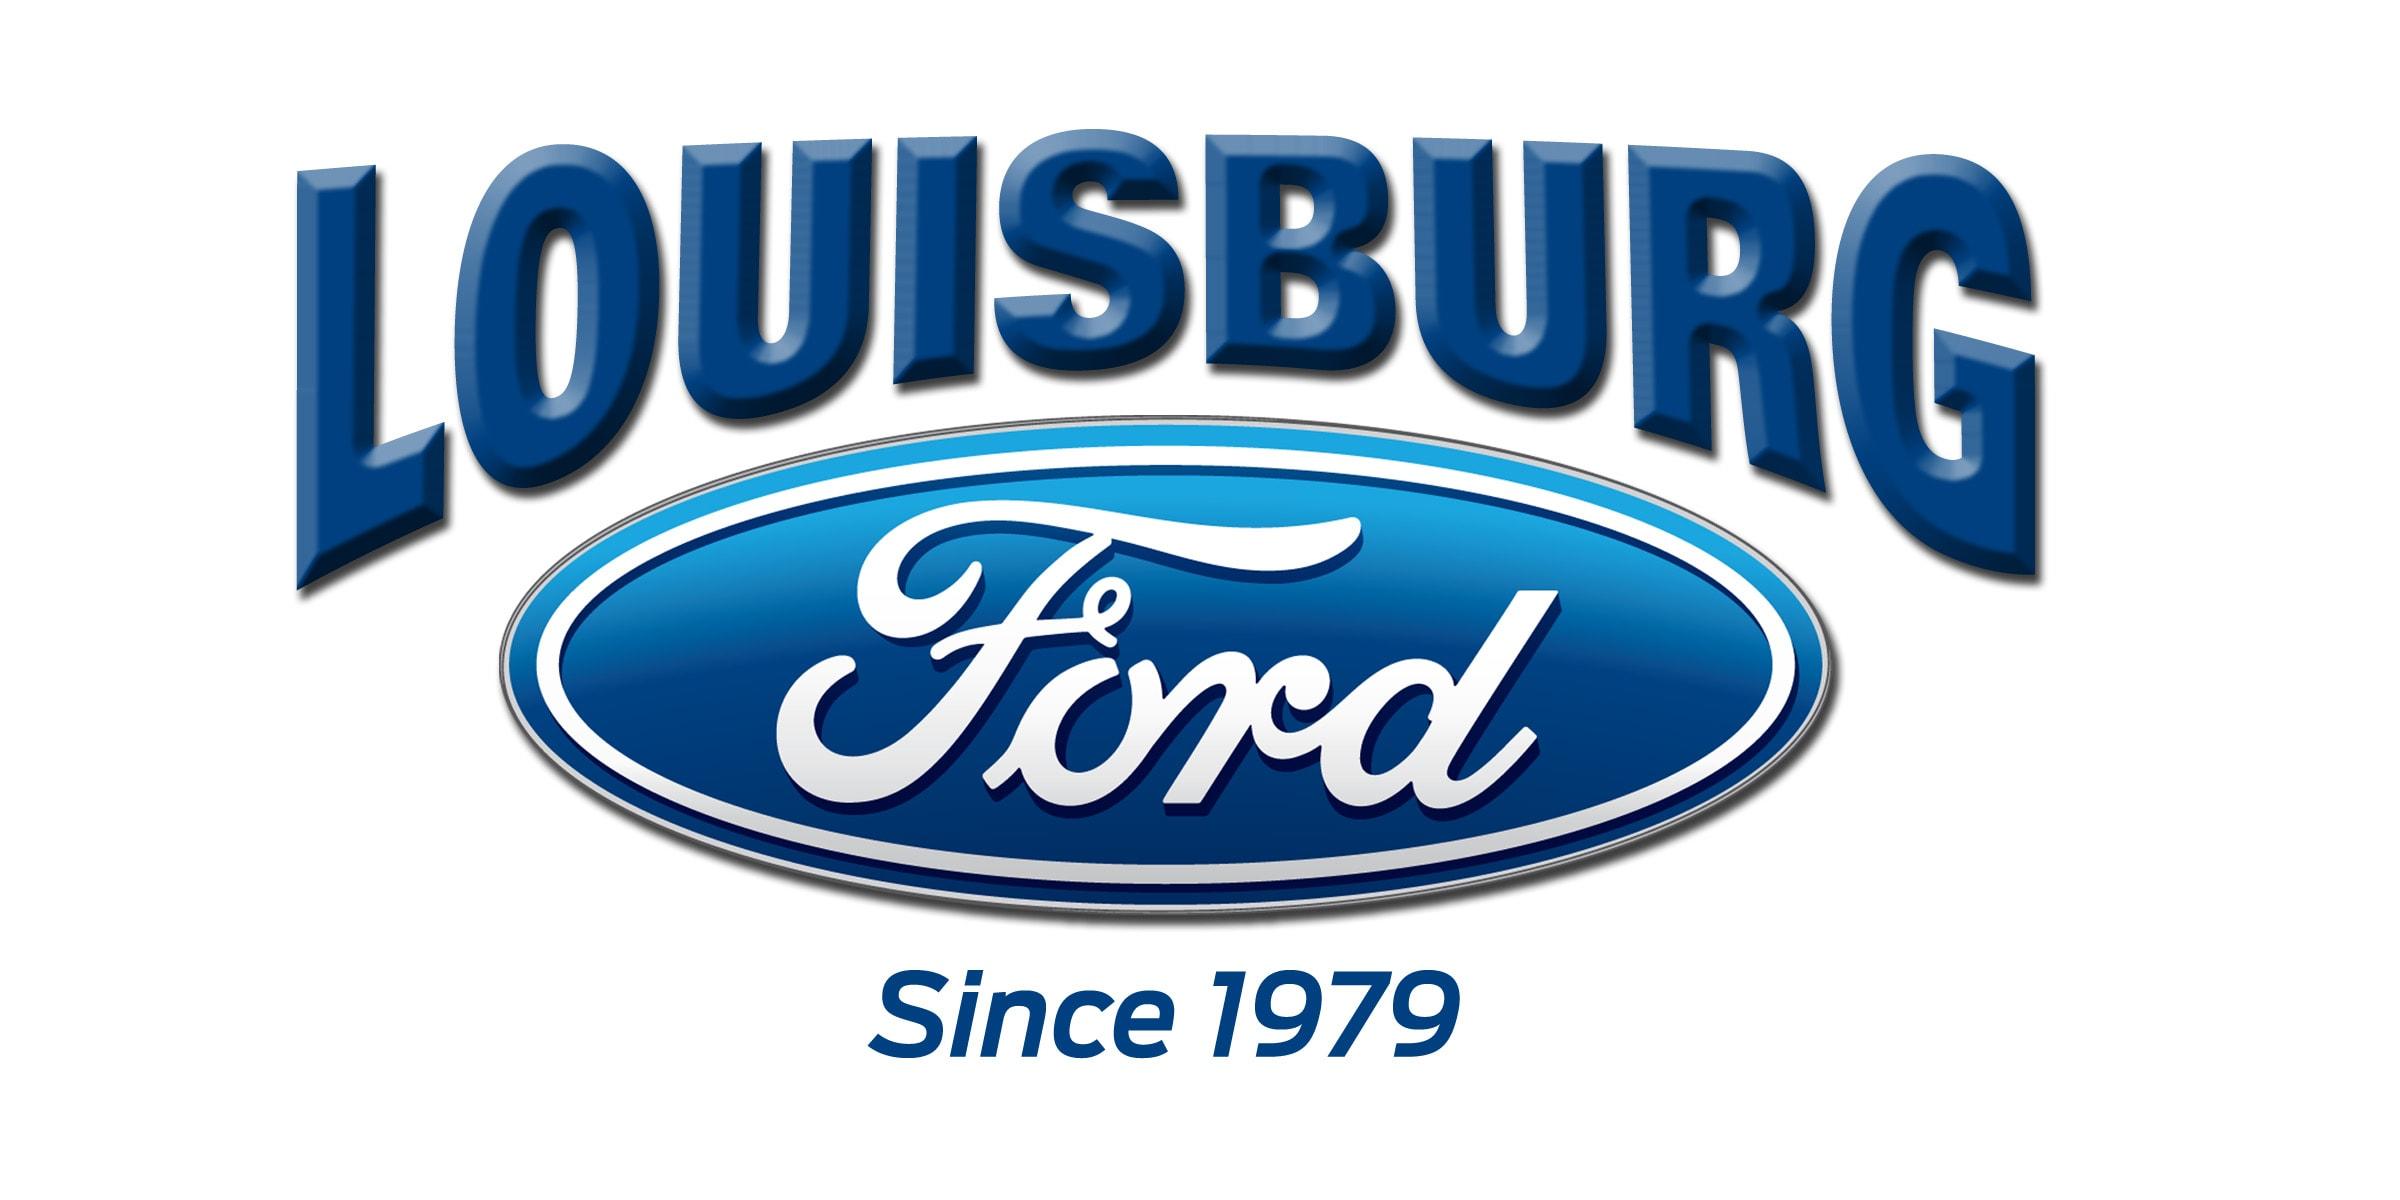 www.louisburgford.com